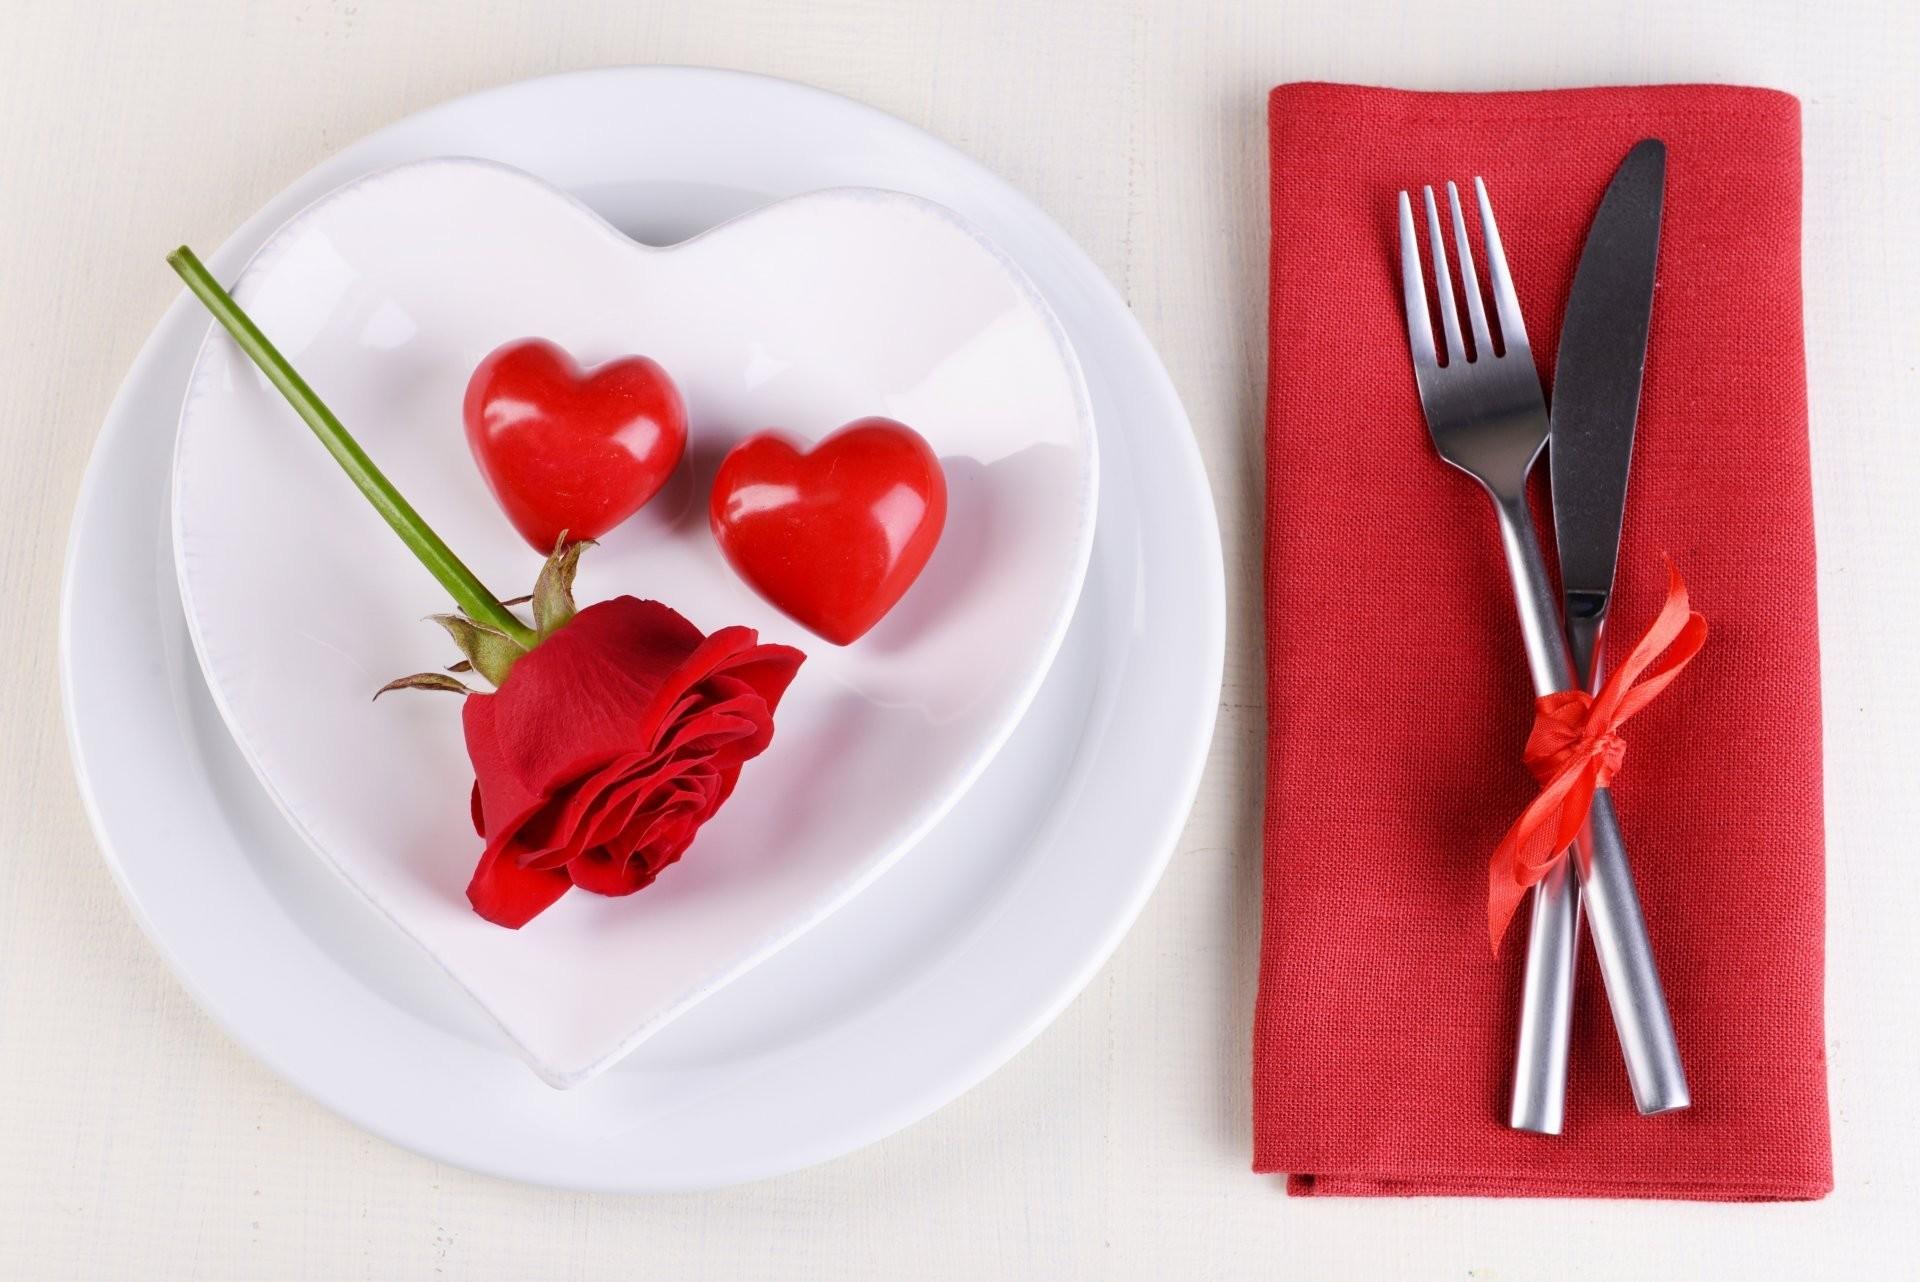 valentine's day love heart romantic love heart romance serving dish